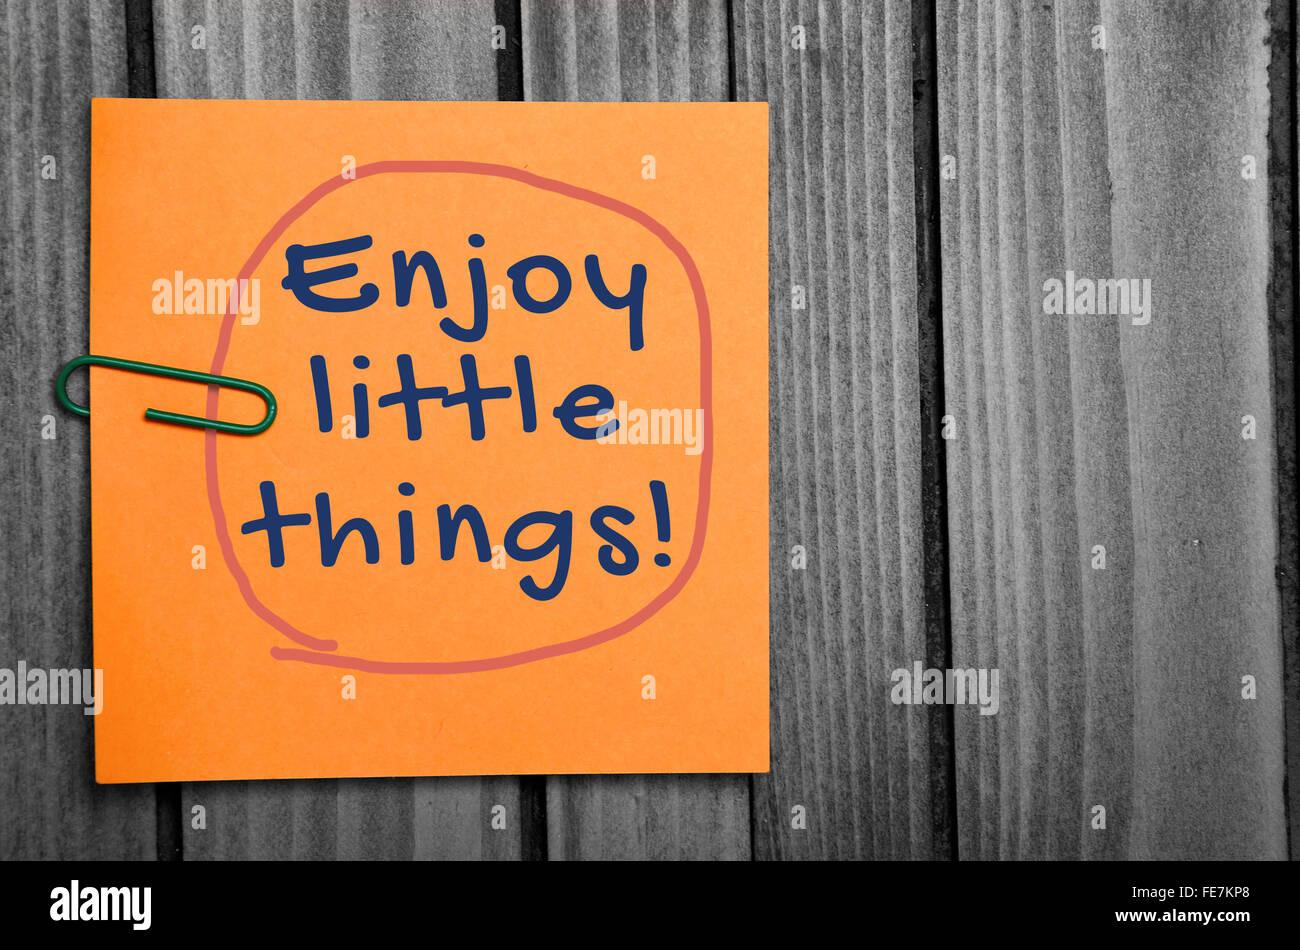 Enjoy little things word on orange notes Stock Photo